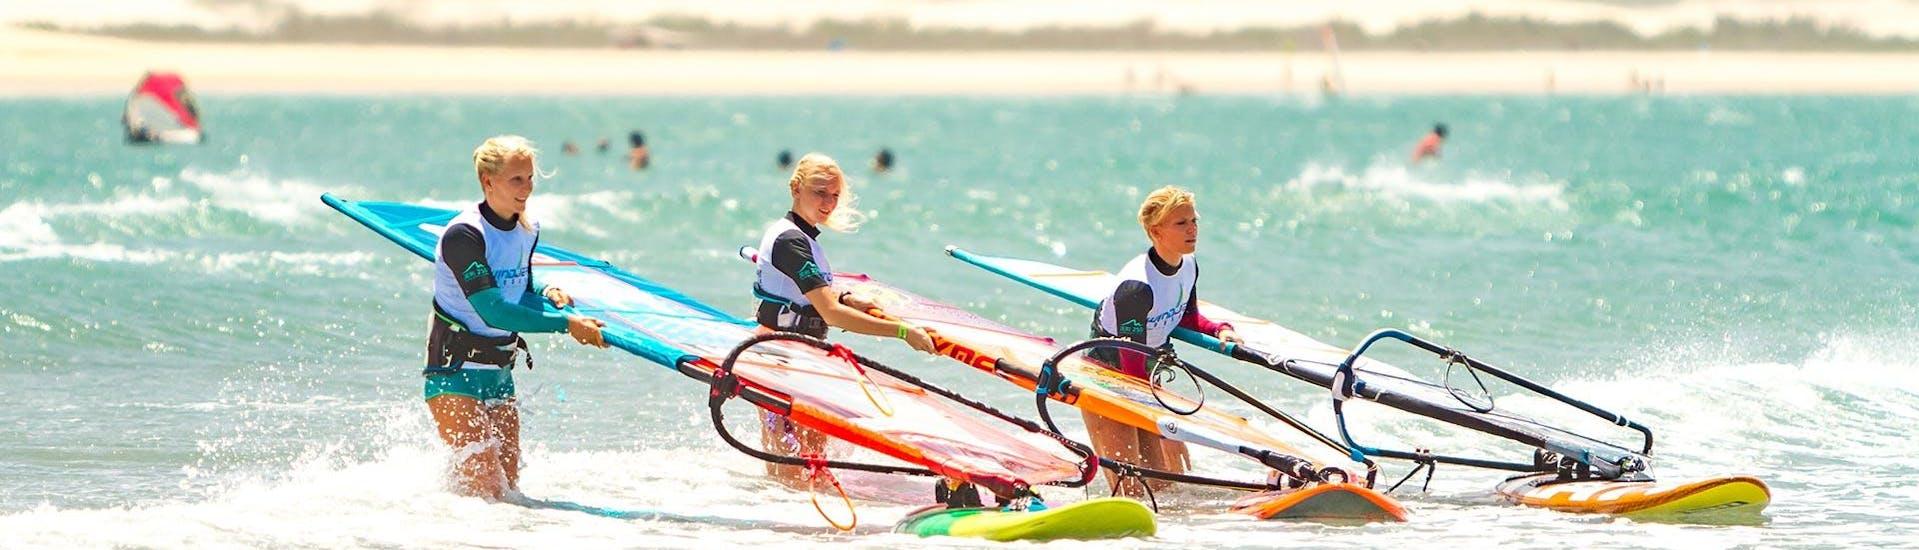 Windsurfing Lessons at Lister Ellenbogen for Beginners